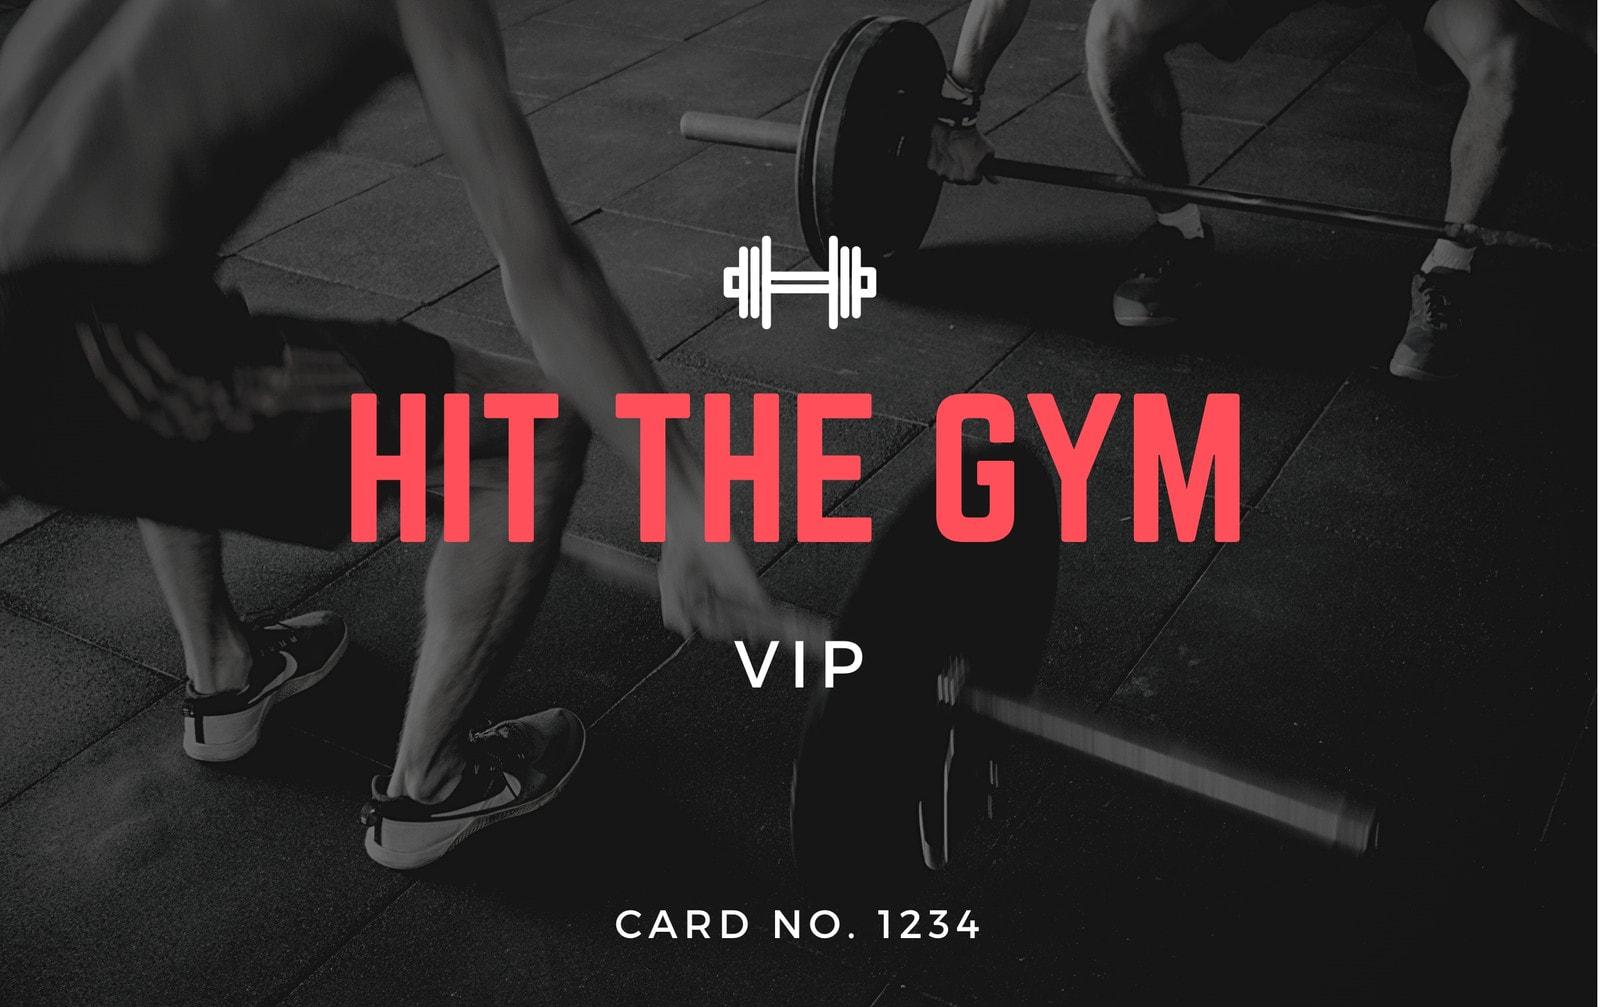 Black Workout Fitness Membership Card ID Card